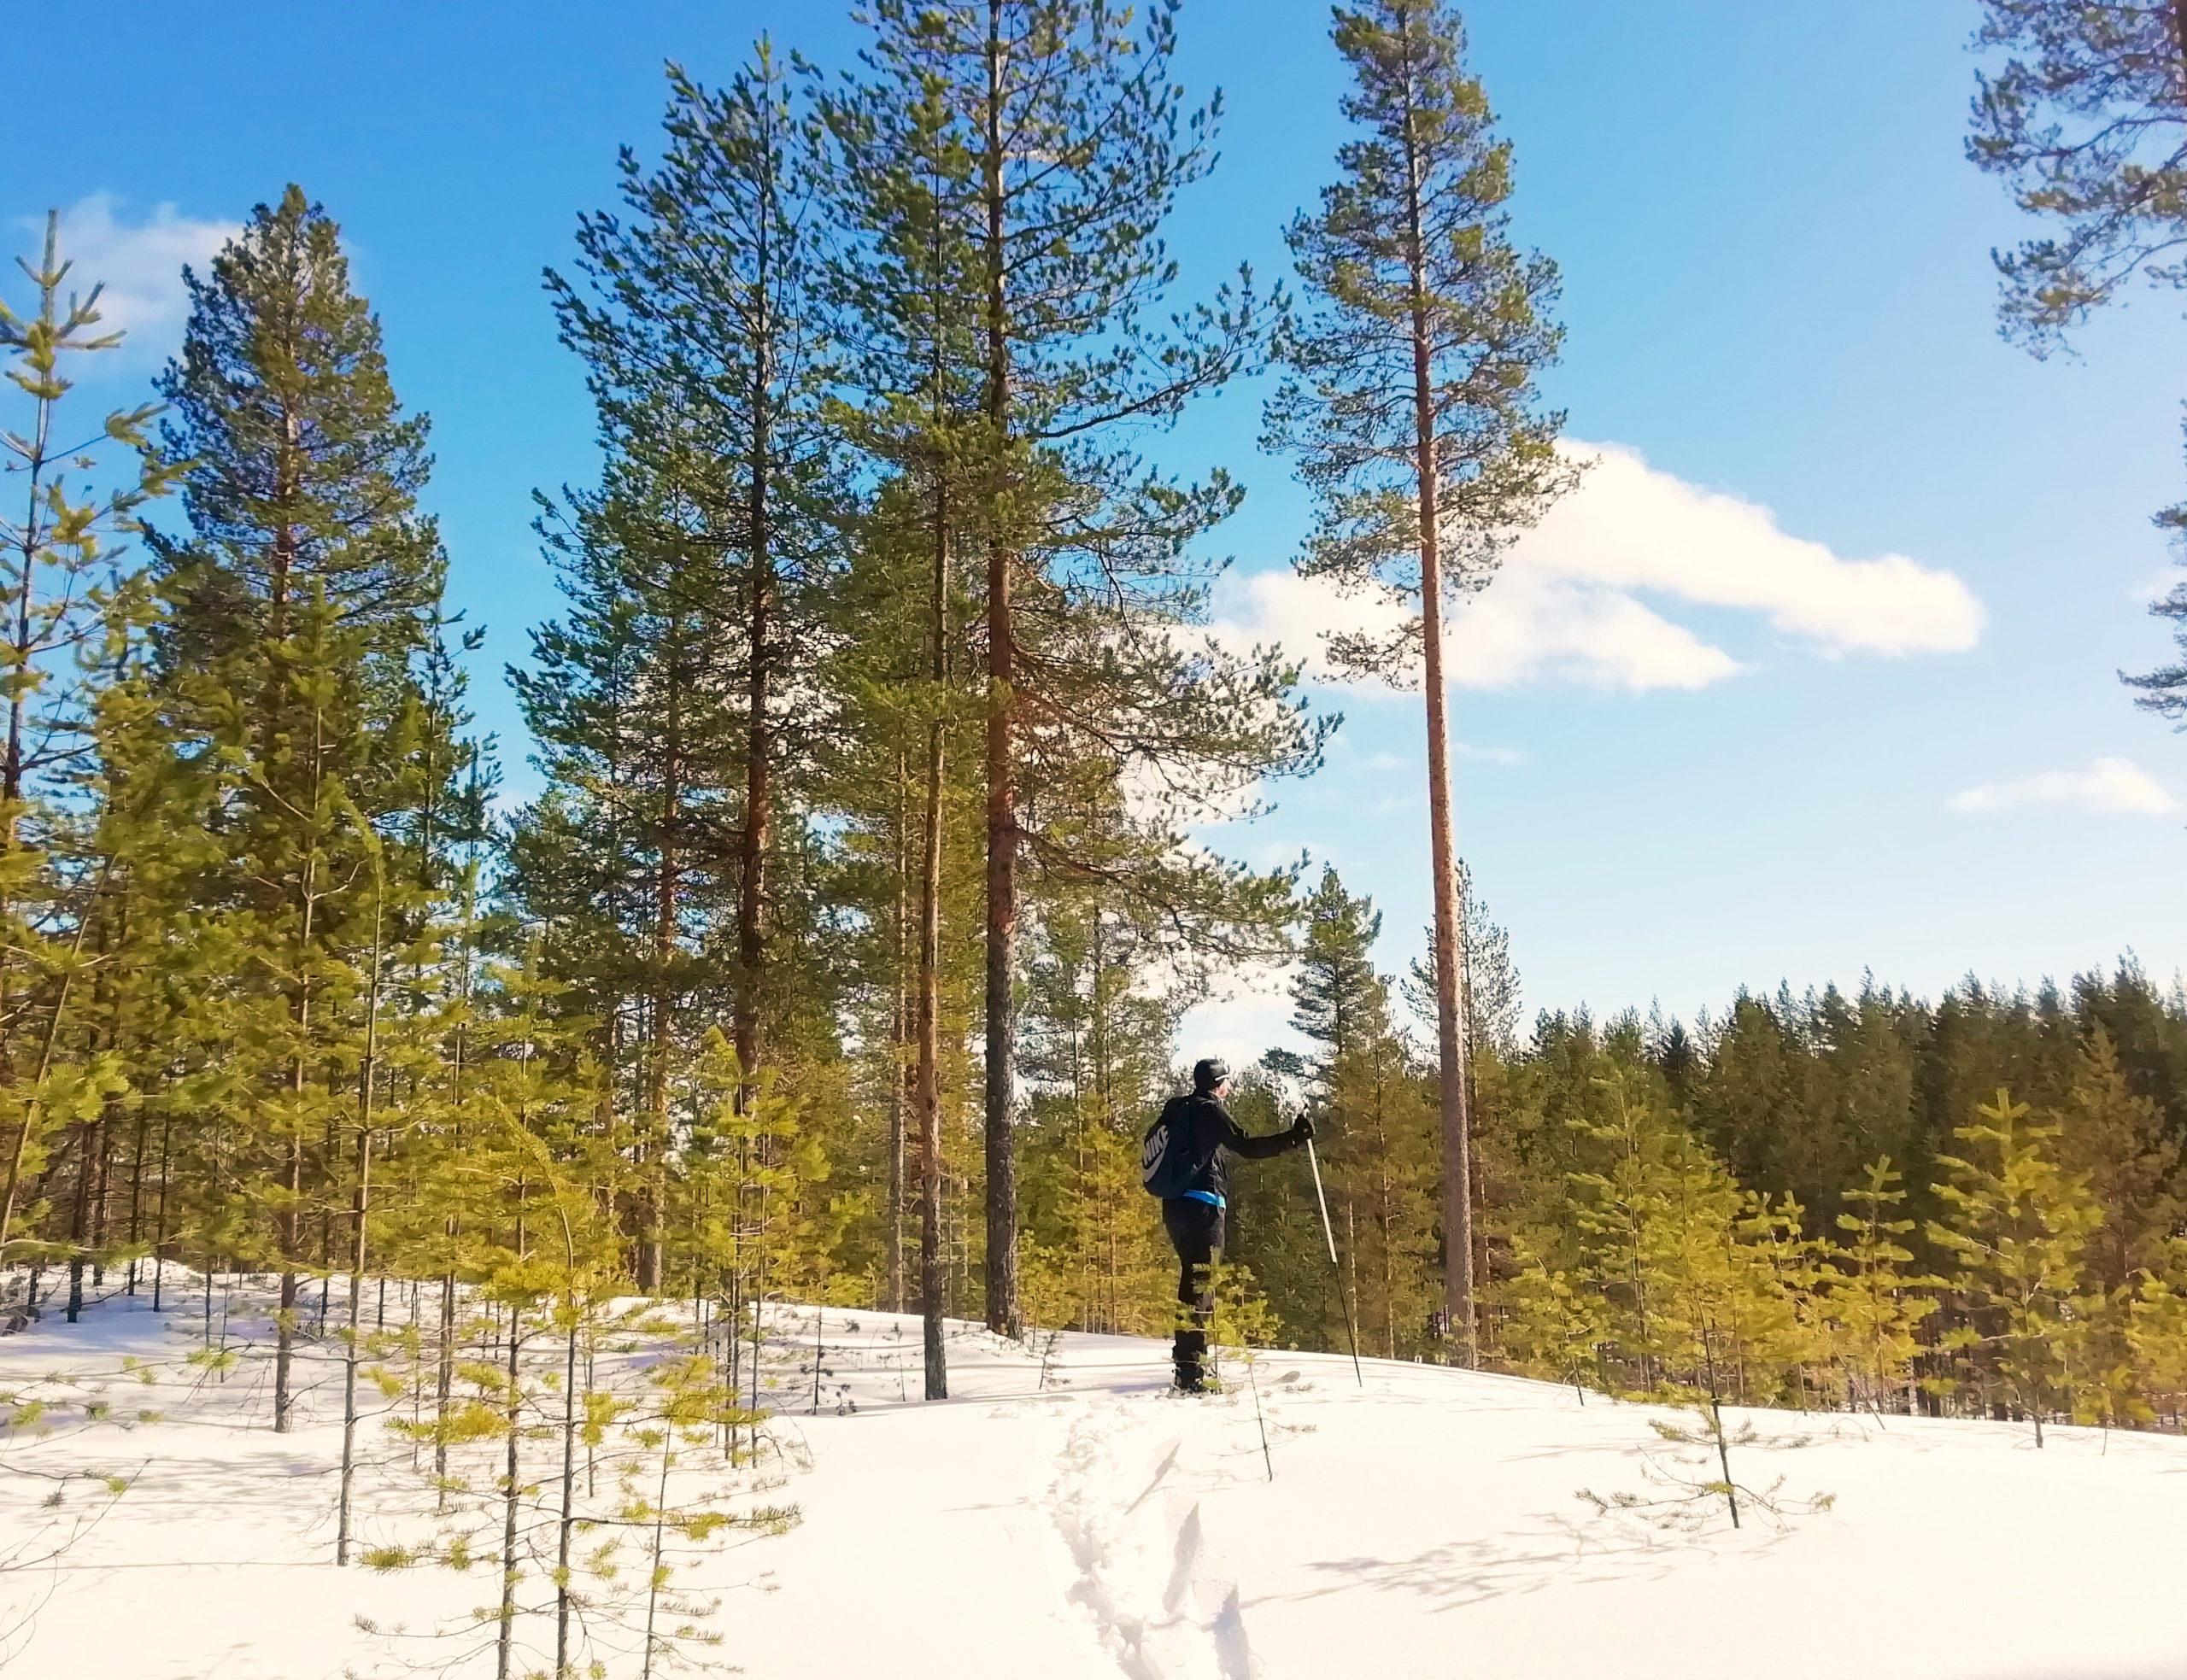 Snowshoeing in Rokua, Finland | FinnsAway